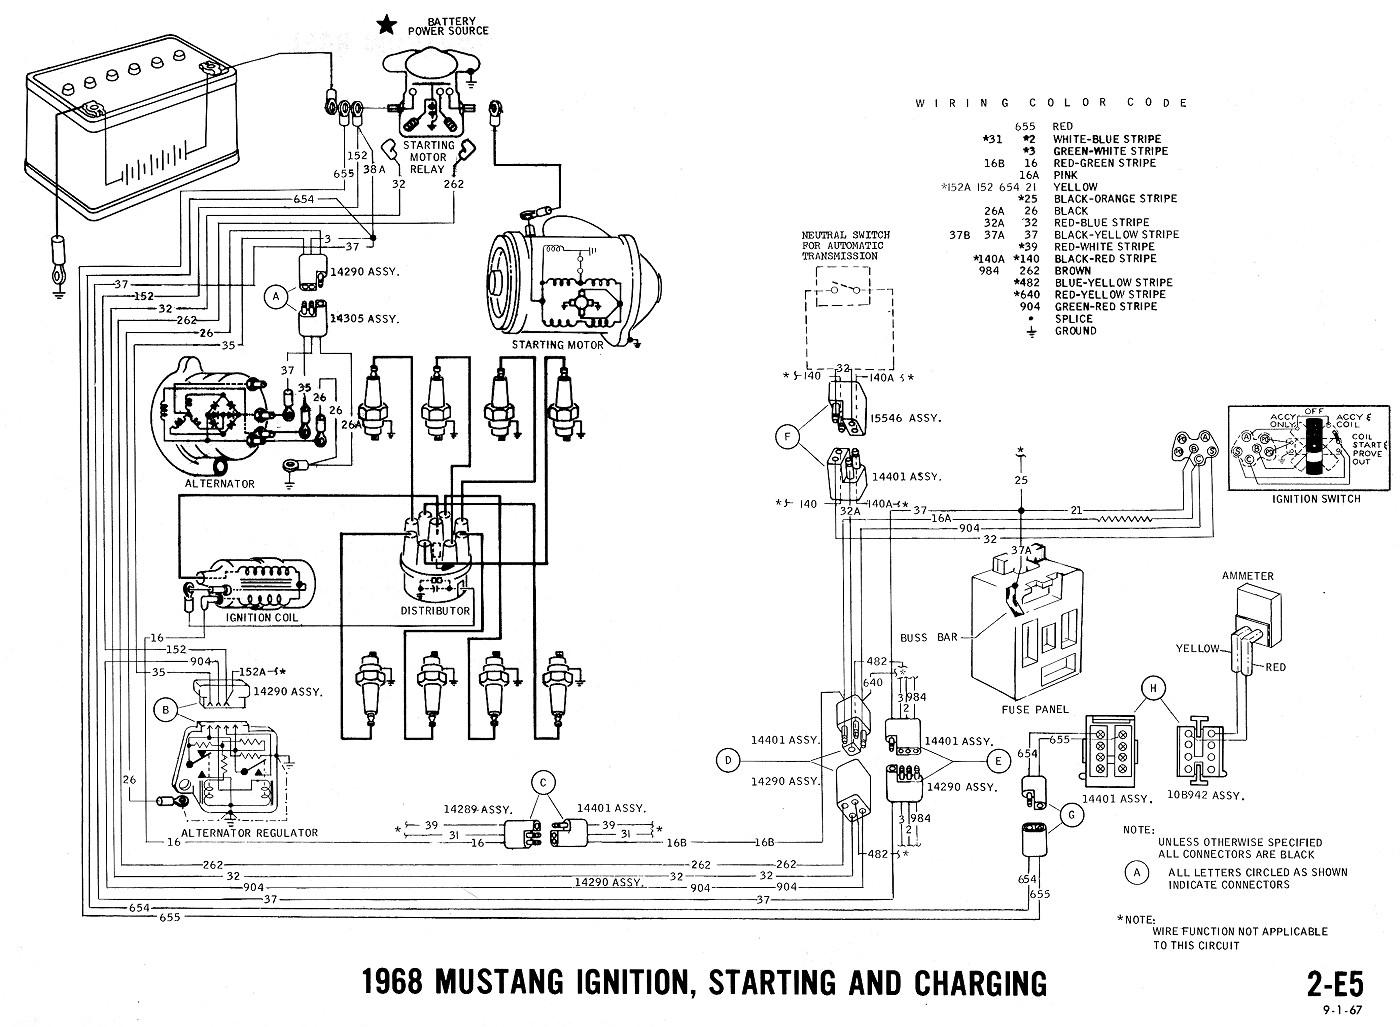 67 Ford Alternator Wiring Diagram - Wiring Diagram Networks | Wisconsin Engine Alternator Wiring Diagram |  | Wiring Diagram Networks - blogger